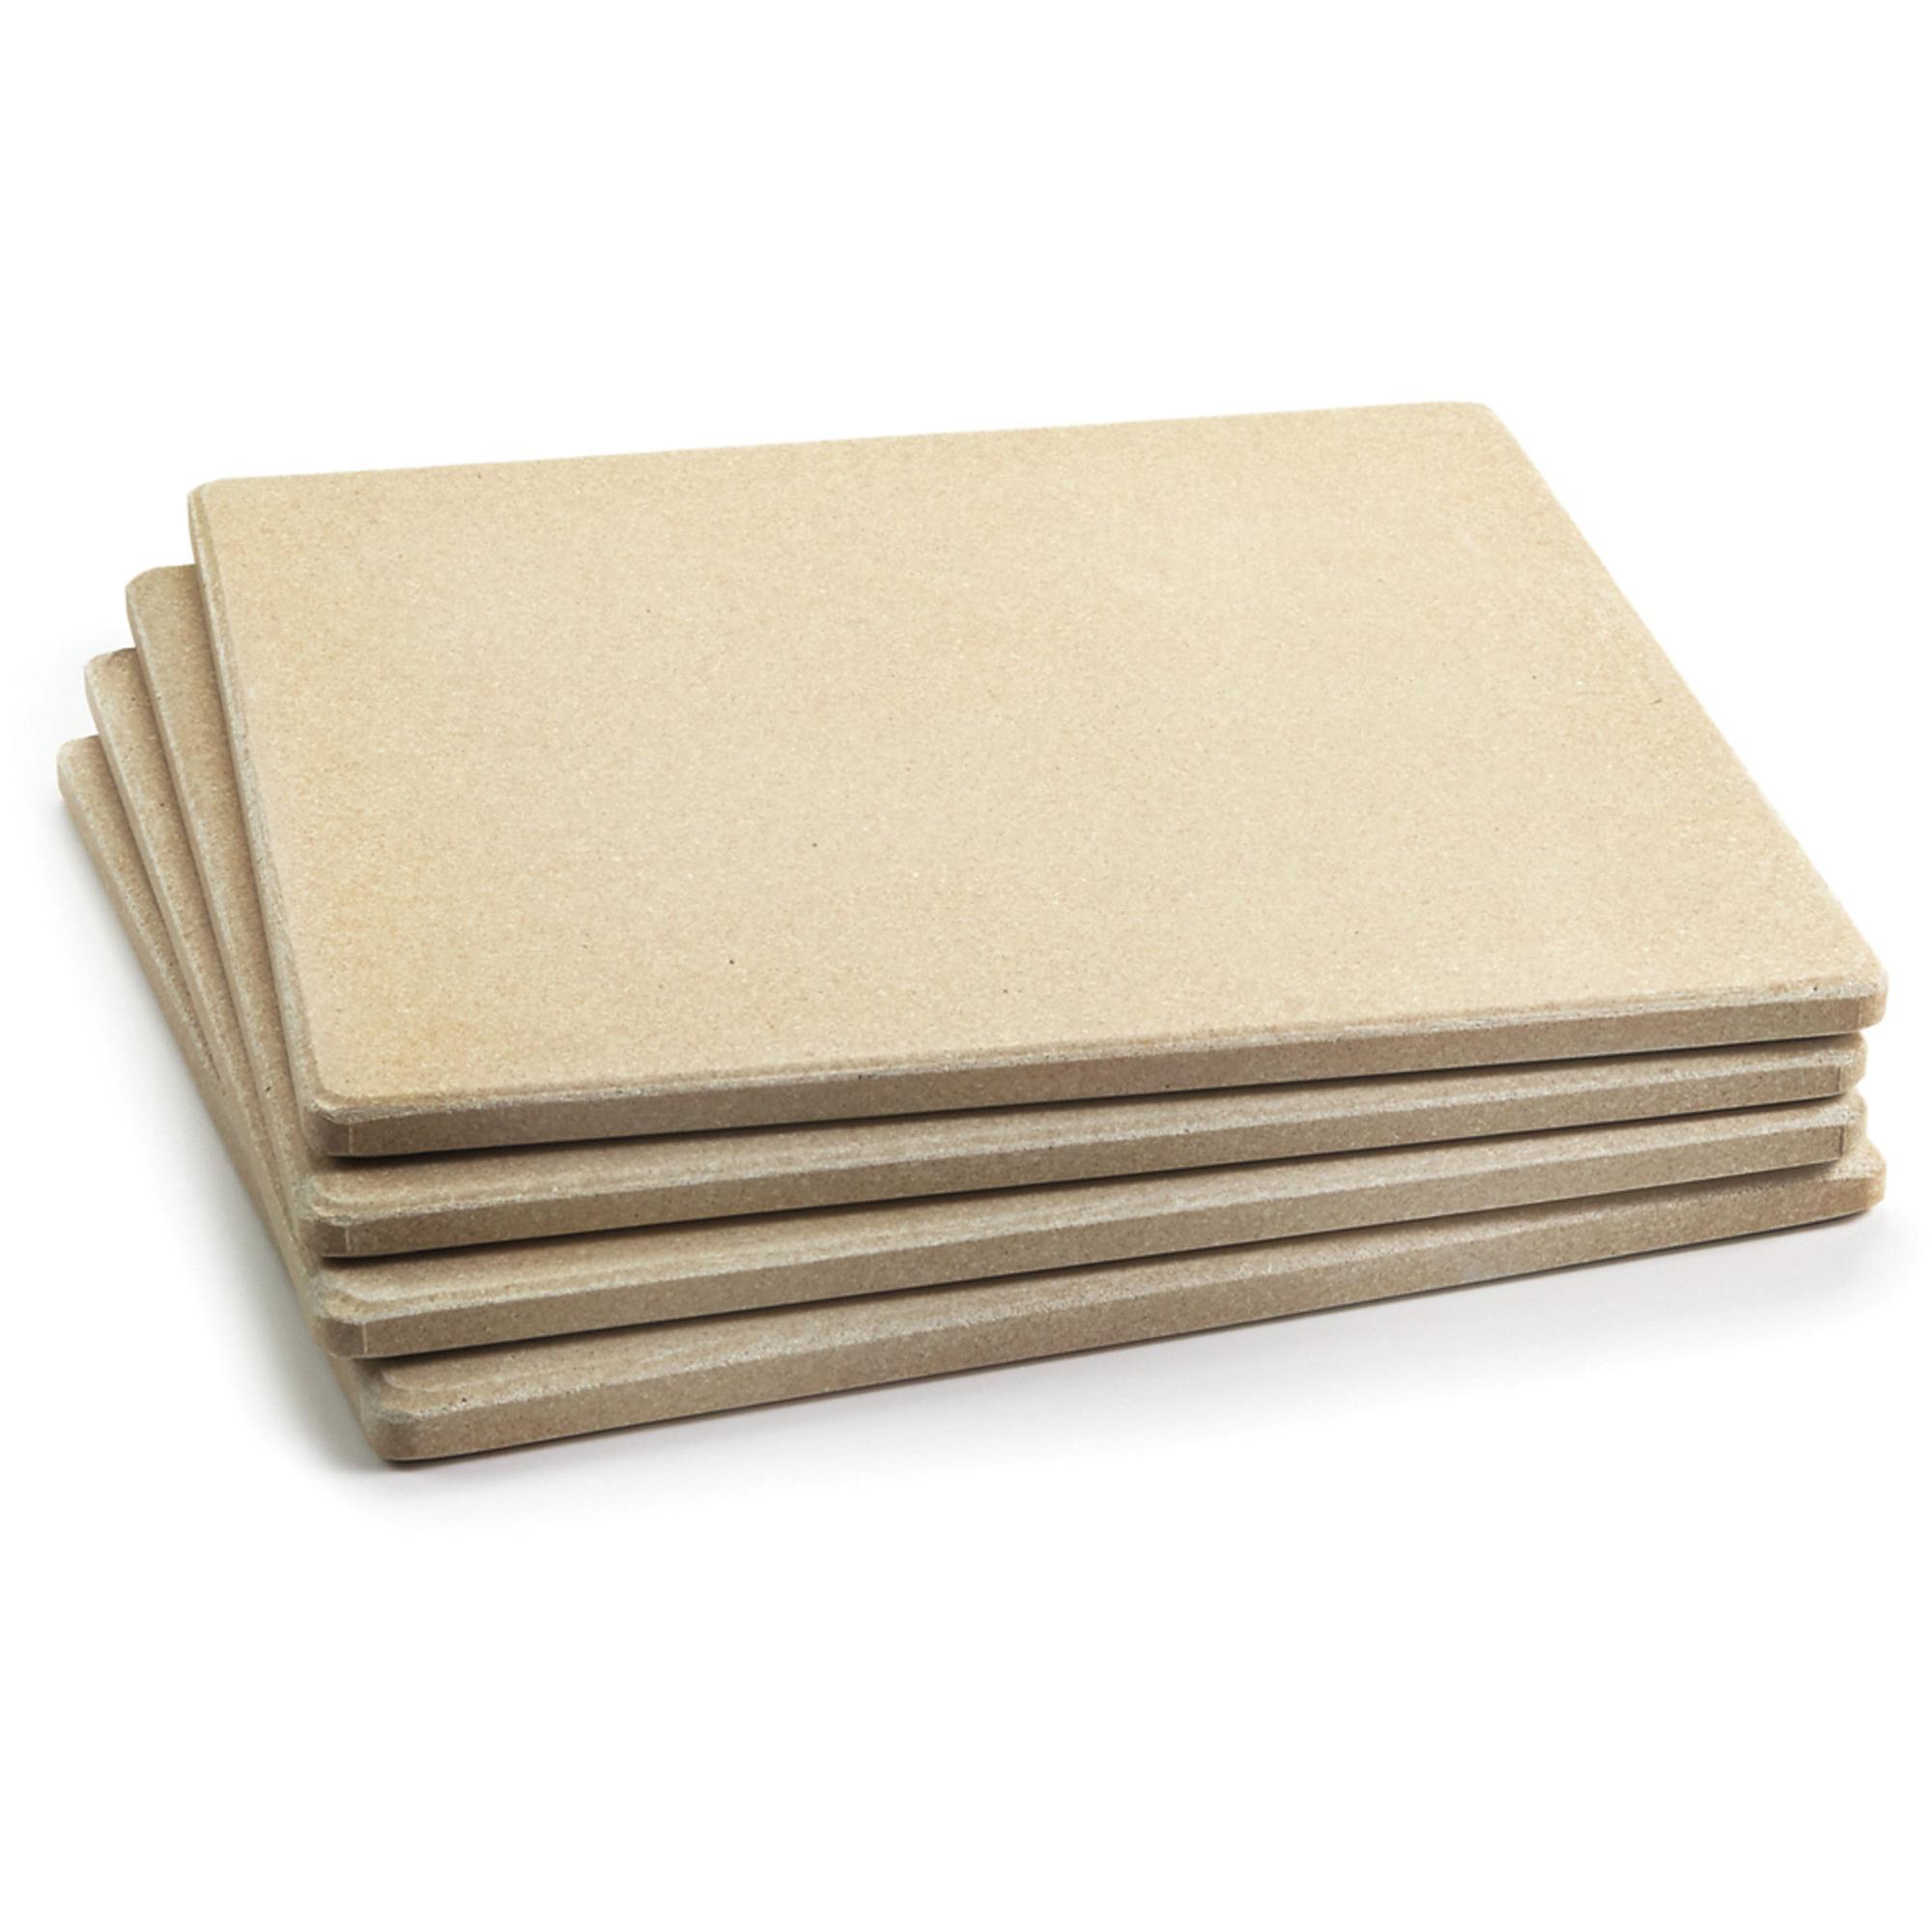 Outset Pizzastenar Keramiska 4 st 19×19 cm